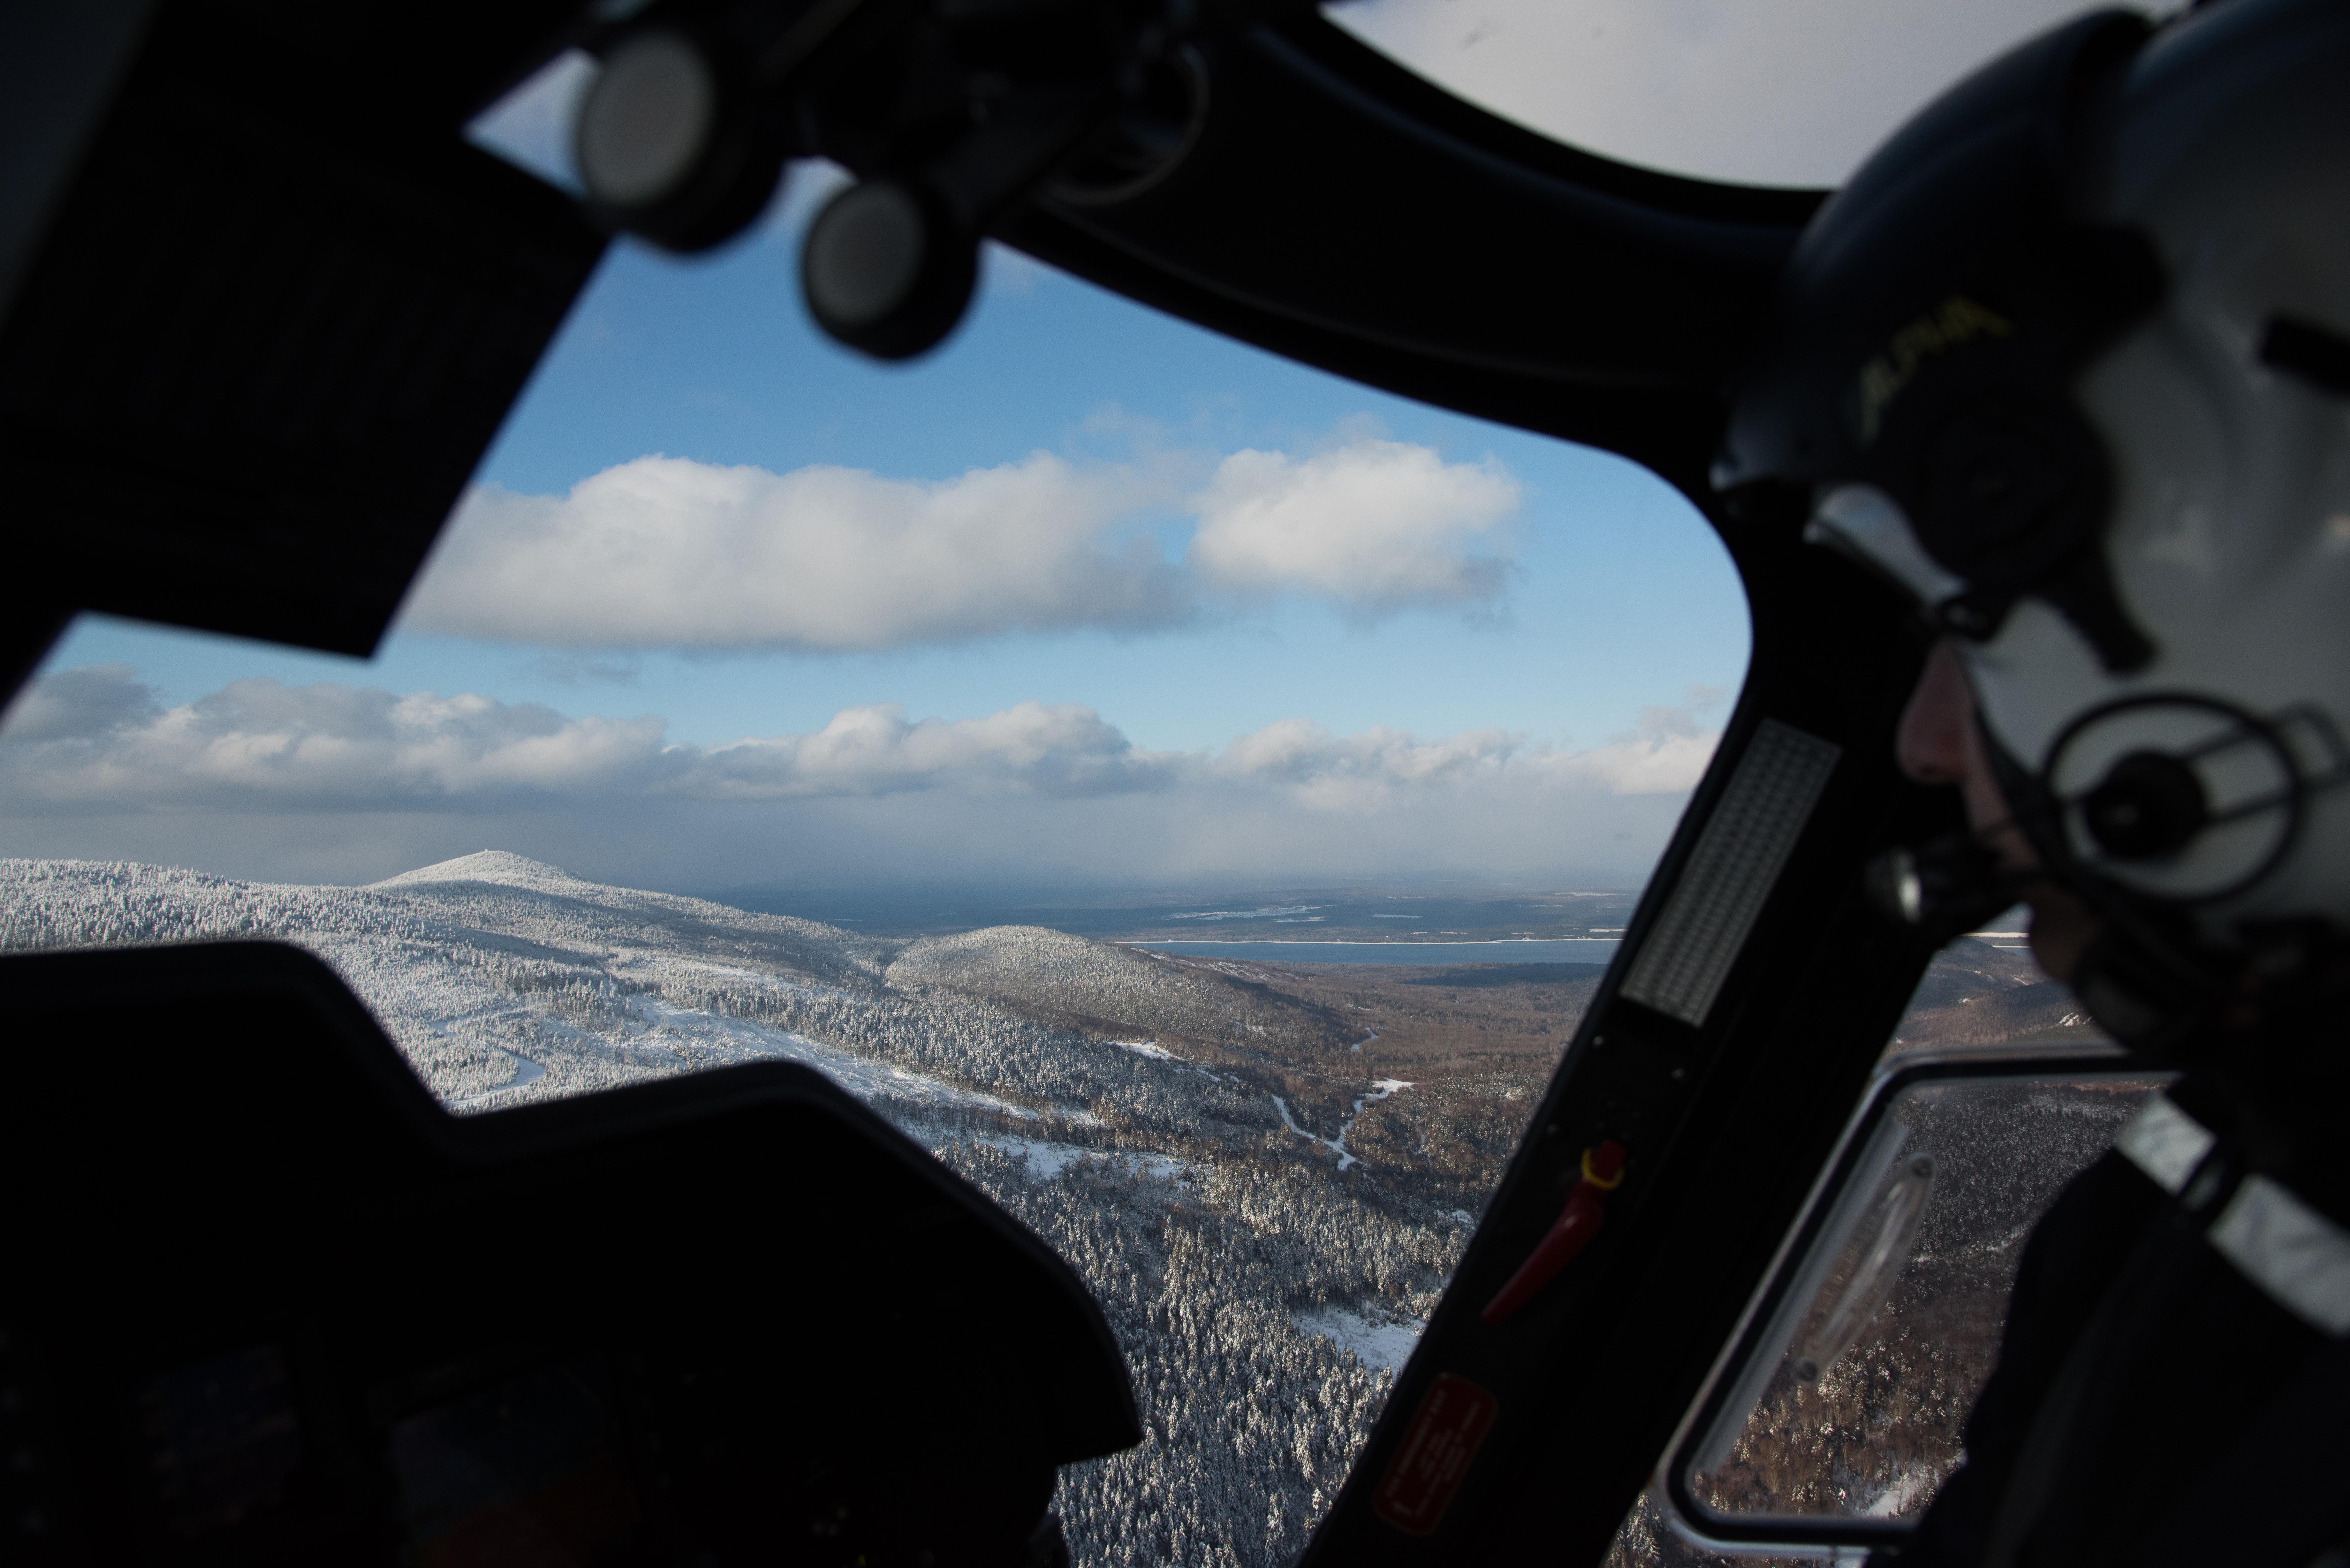 Agusta helicopter Mt Katahdin Maine